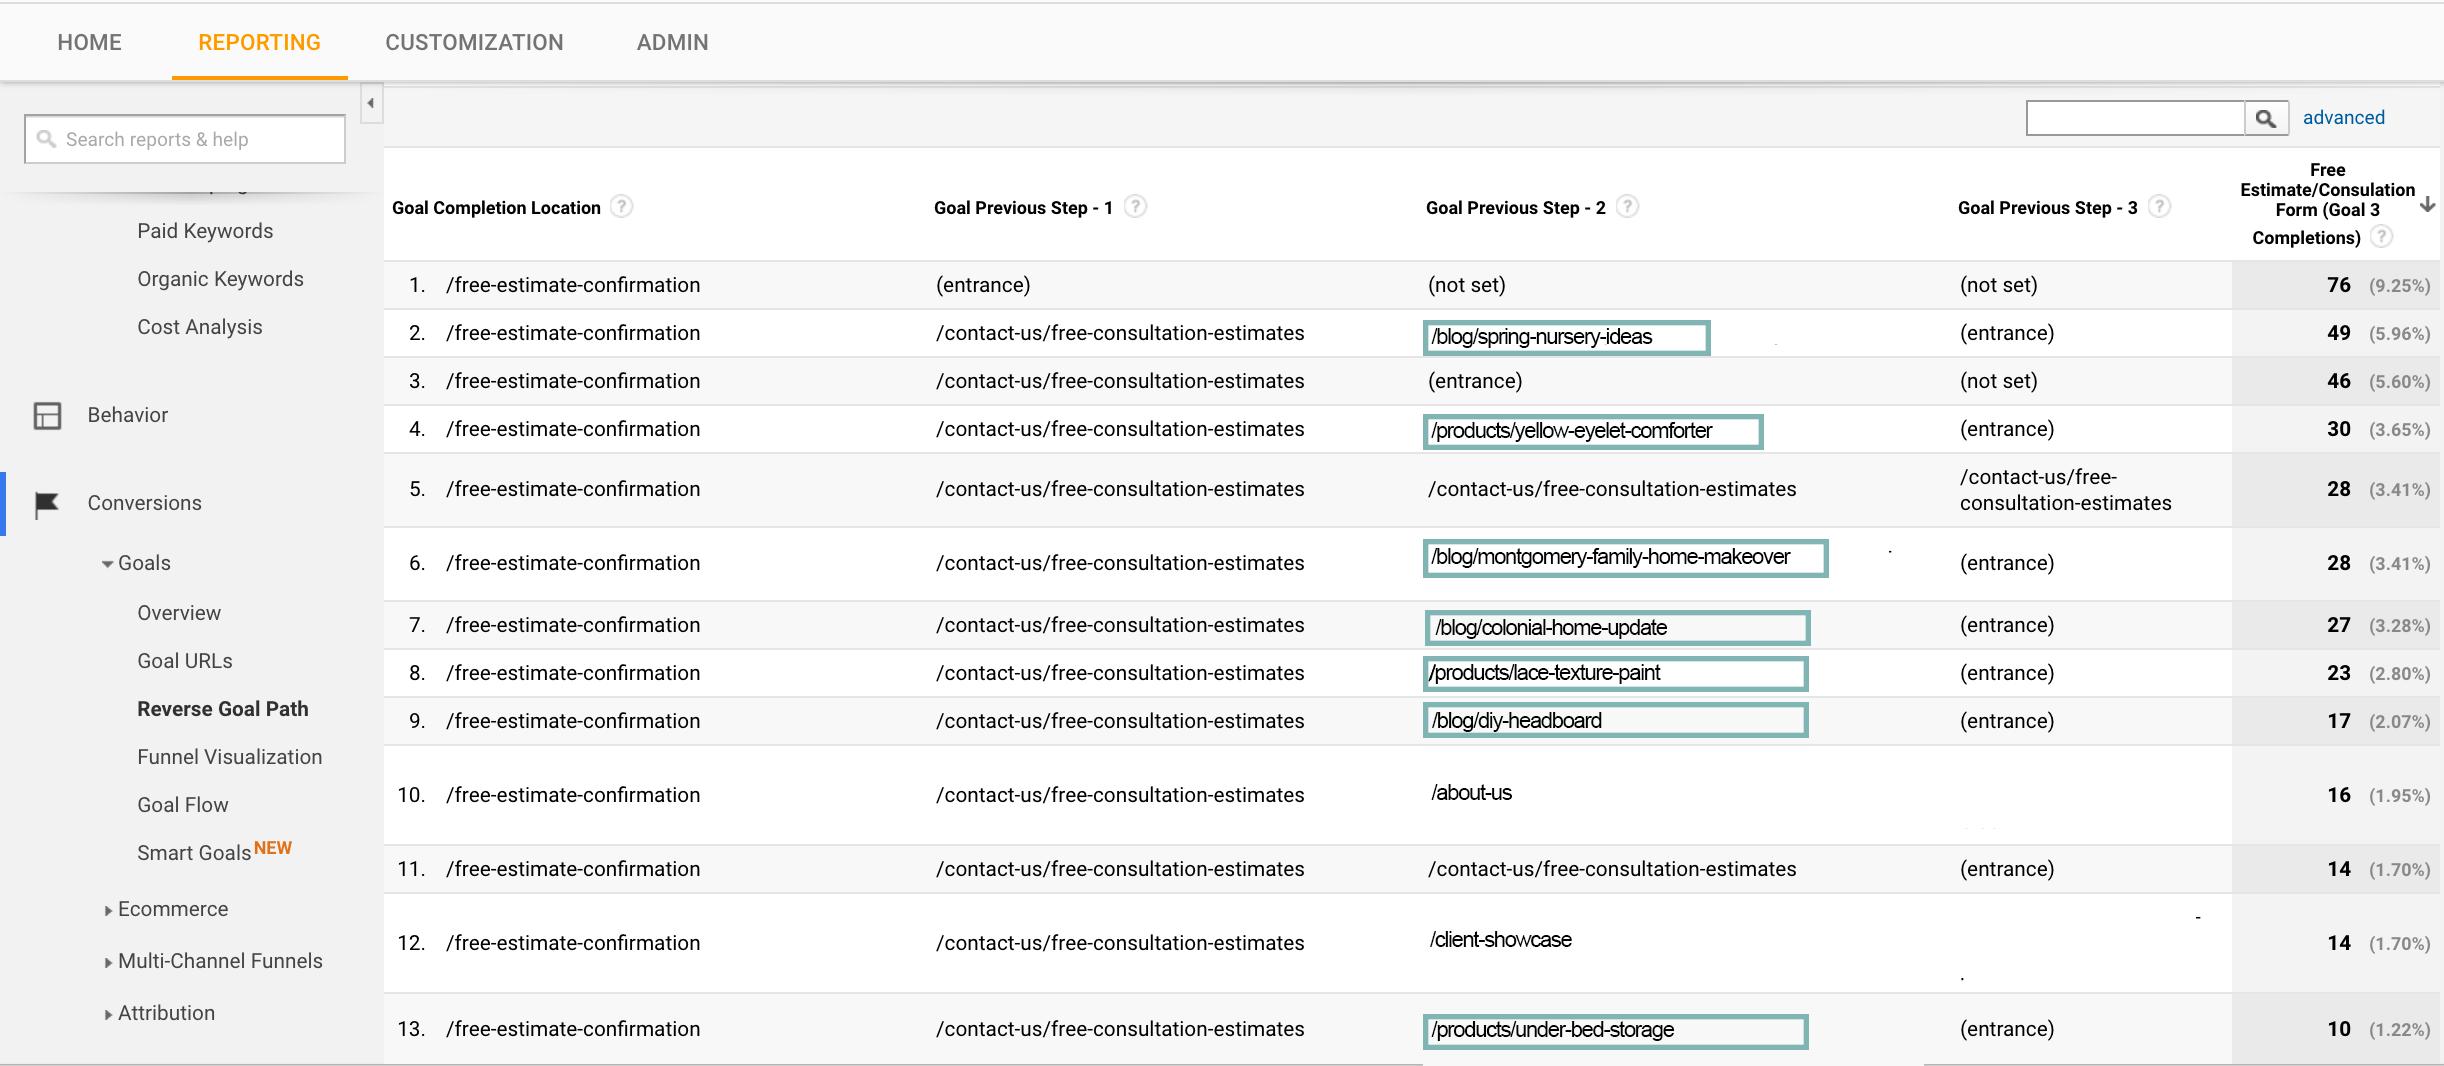 Google Analytics Goal Path